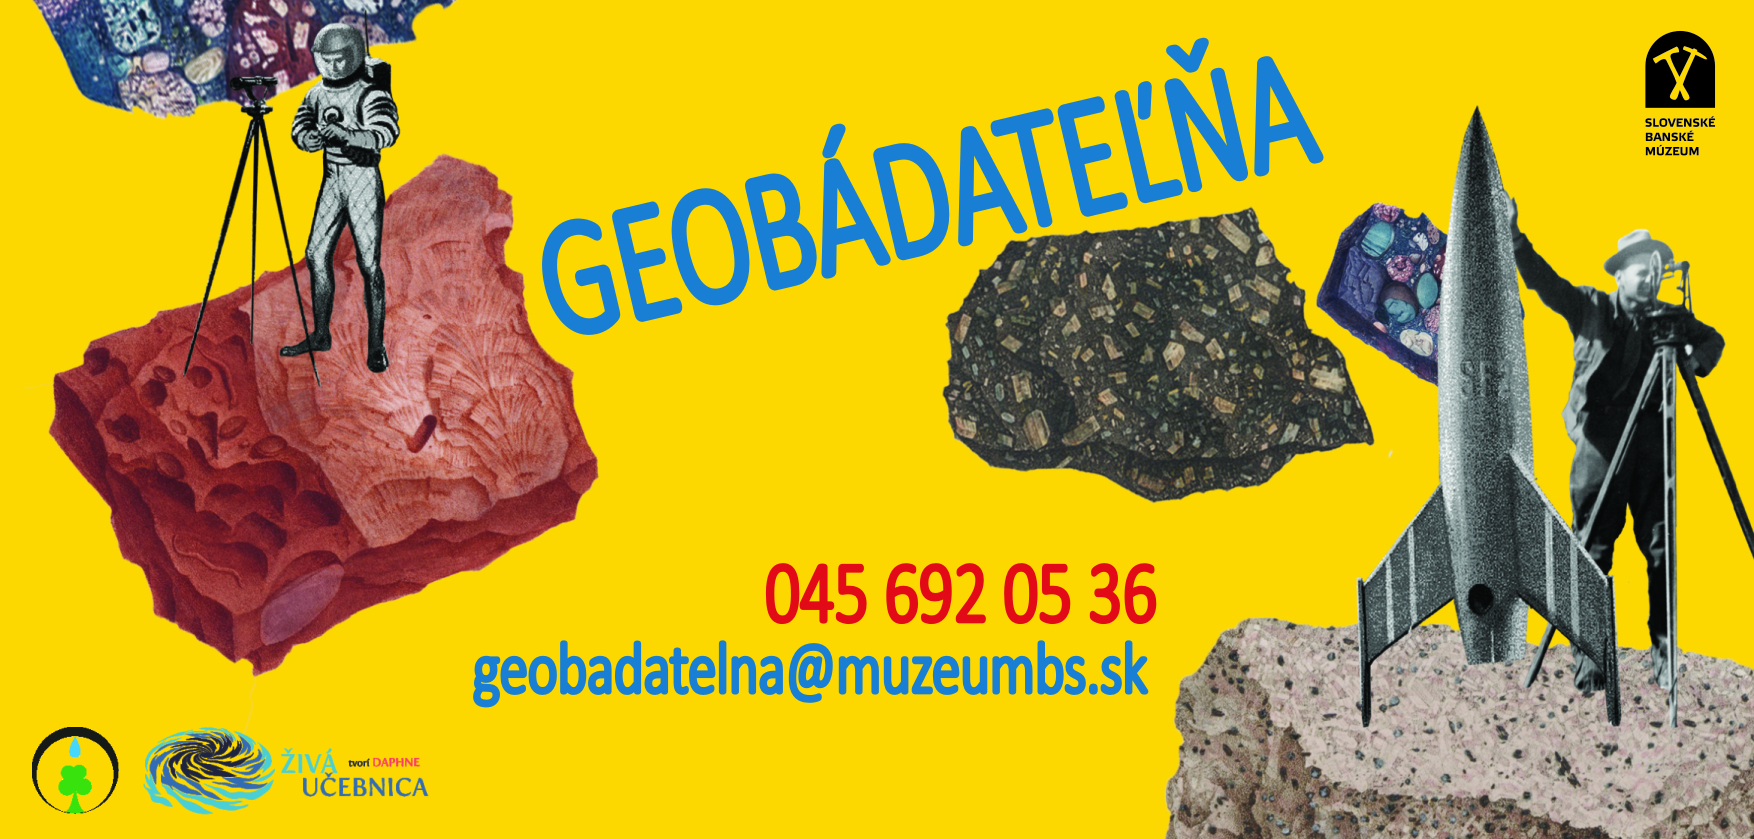 widget_geobadatelna